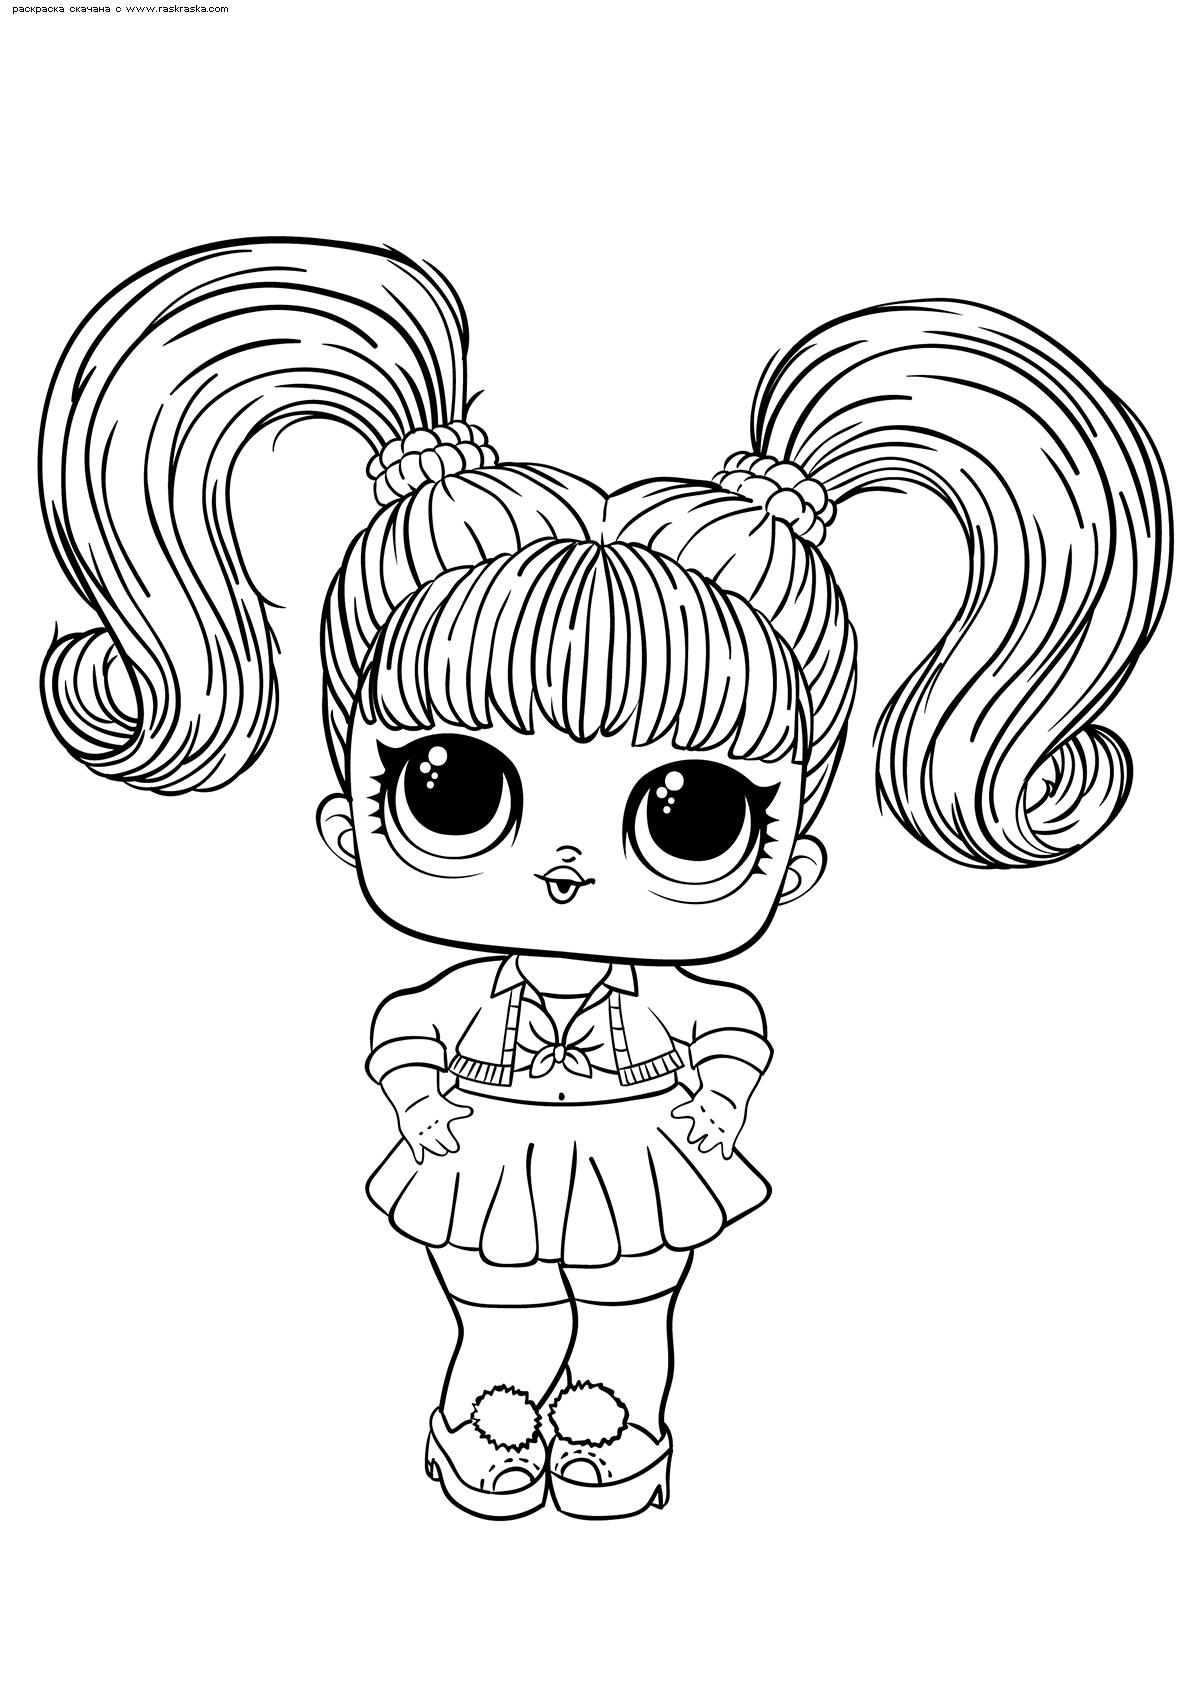 Раскраска ЛОЛ Oops-Baby (малышка Бритни Спирс). Раскраска лол